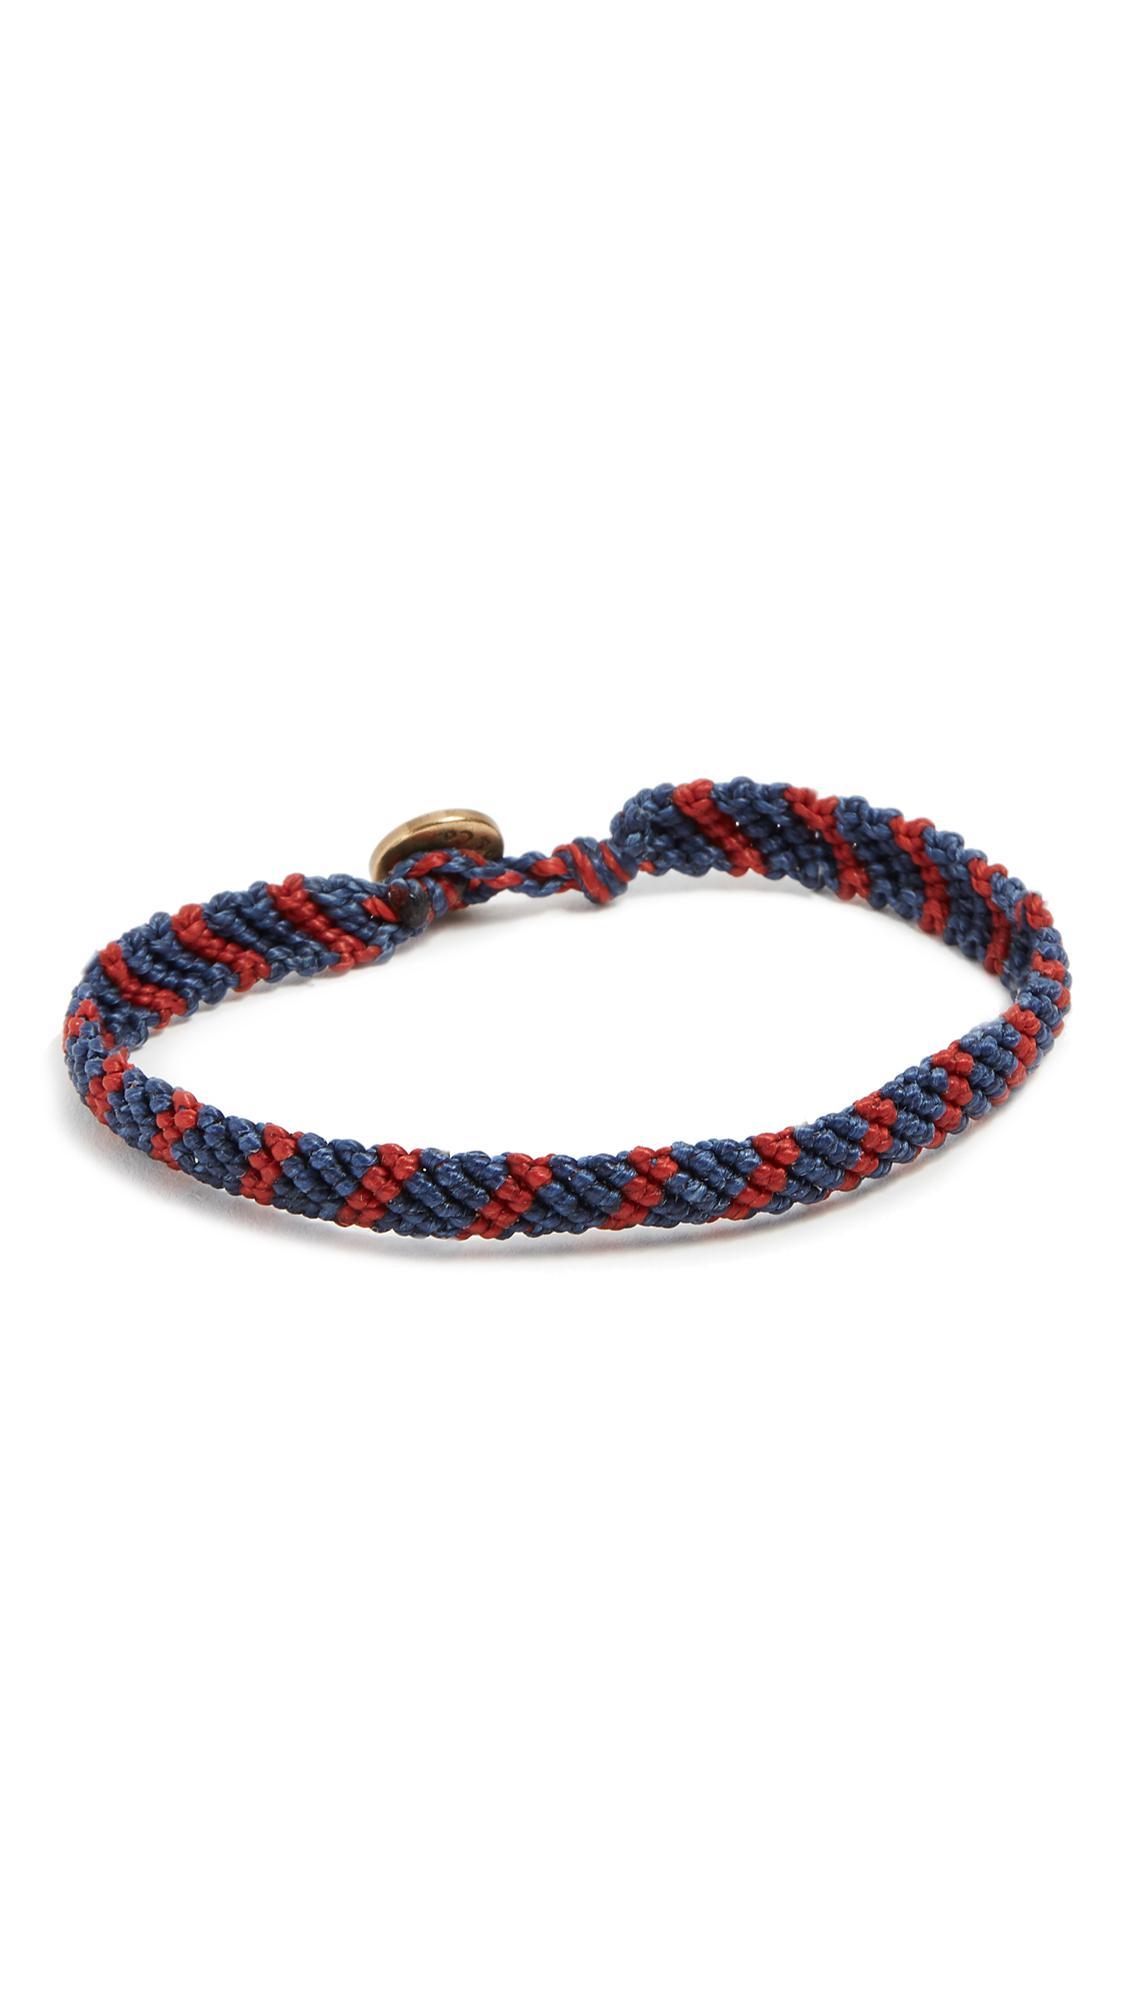 Caputo & Co. Hand-Knotted Stripe Bracelet - Brown/Navy c4Yd9FR